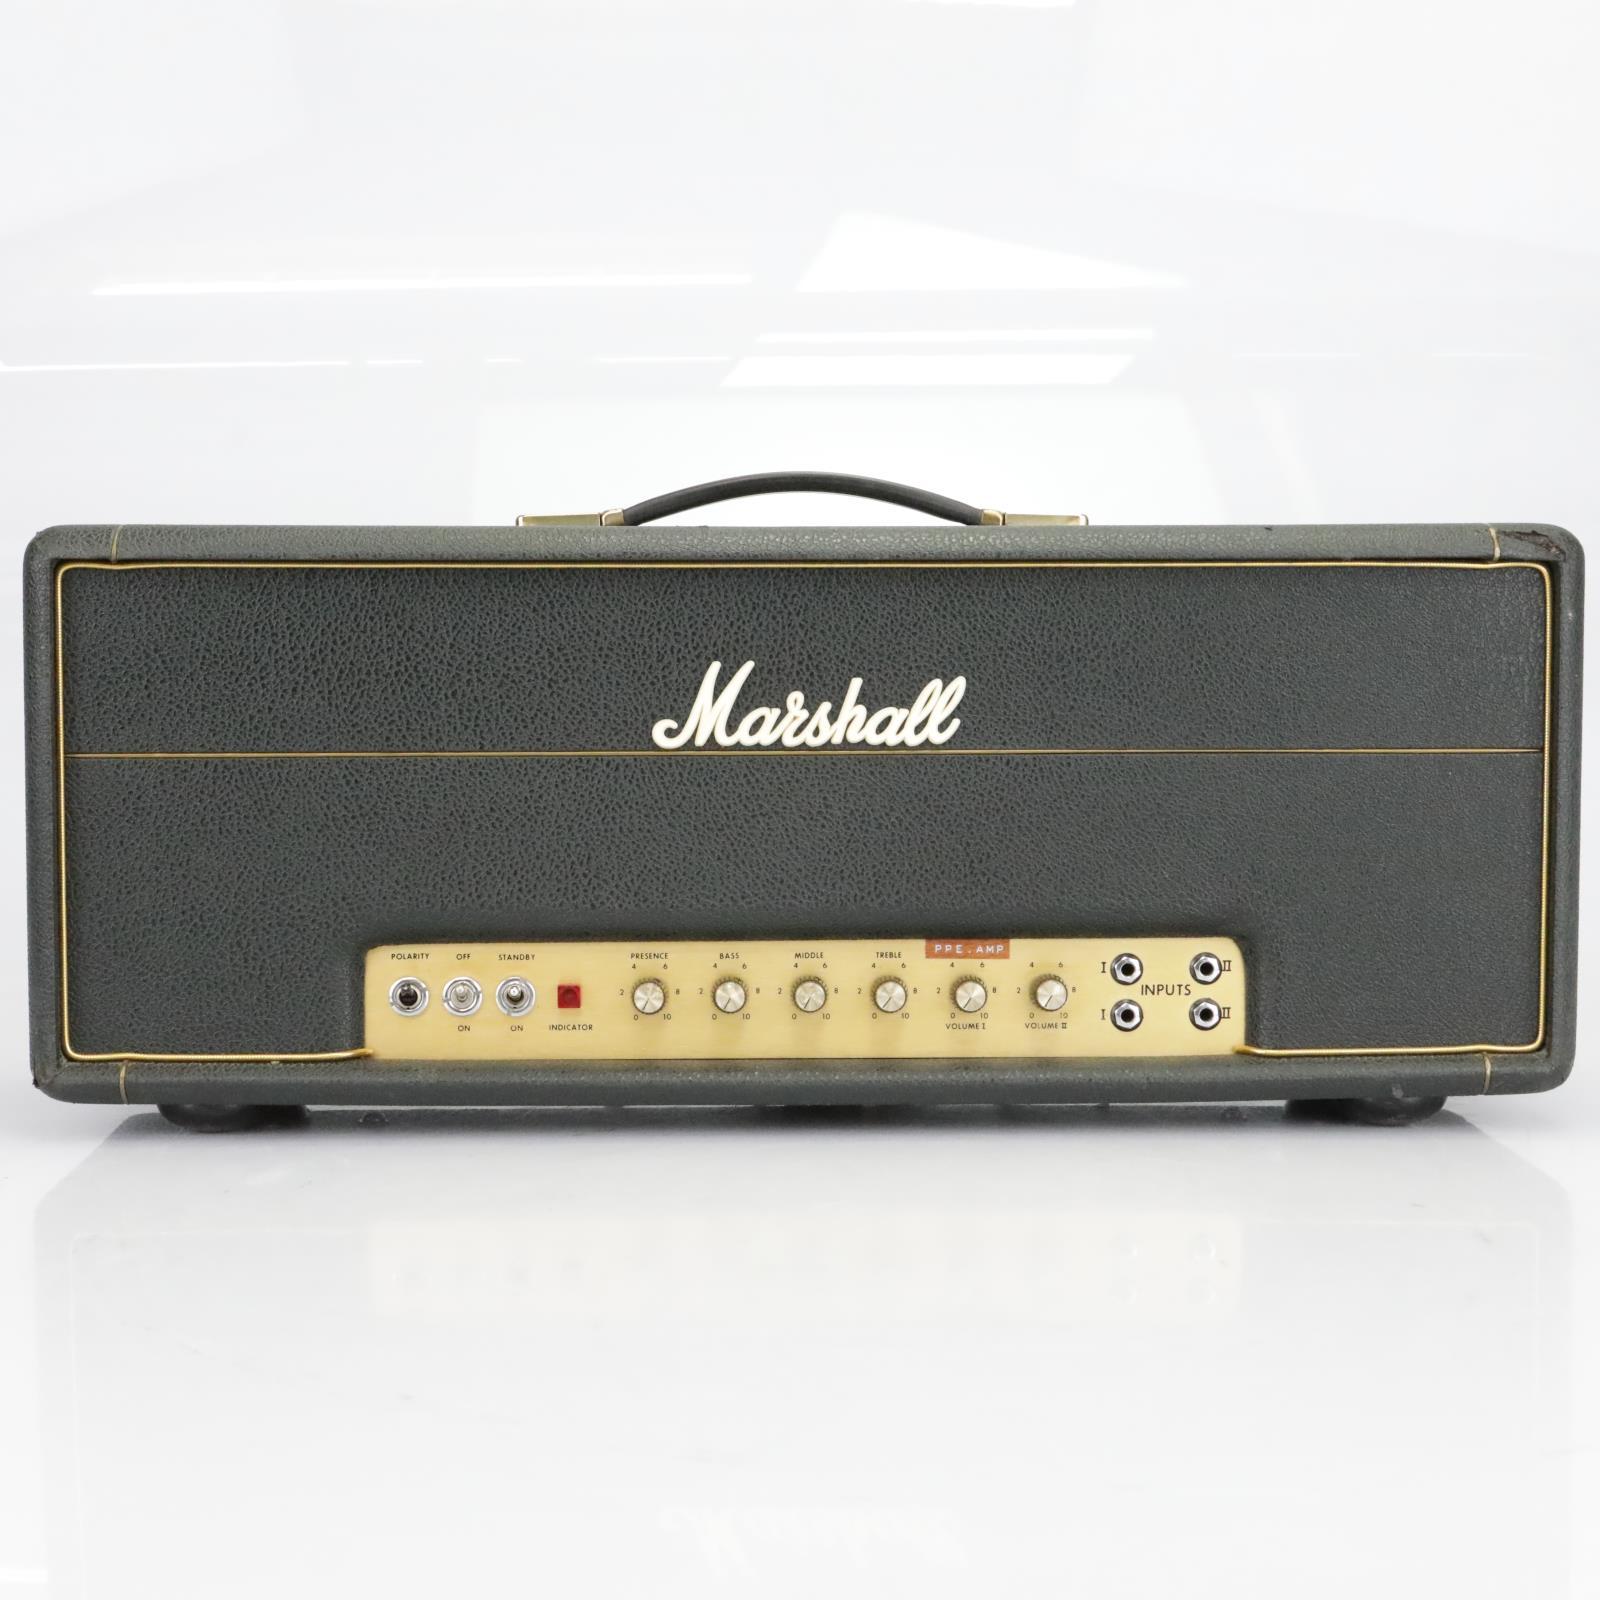 1972 Marshall 50w Lead 4 Input Hand-Wired Guitar Tube Amp Head #40453